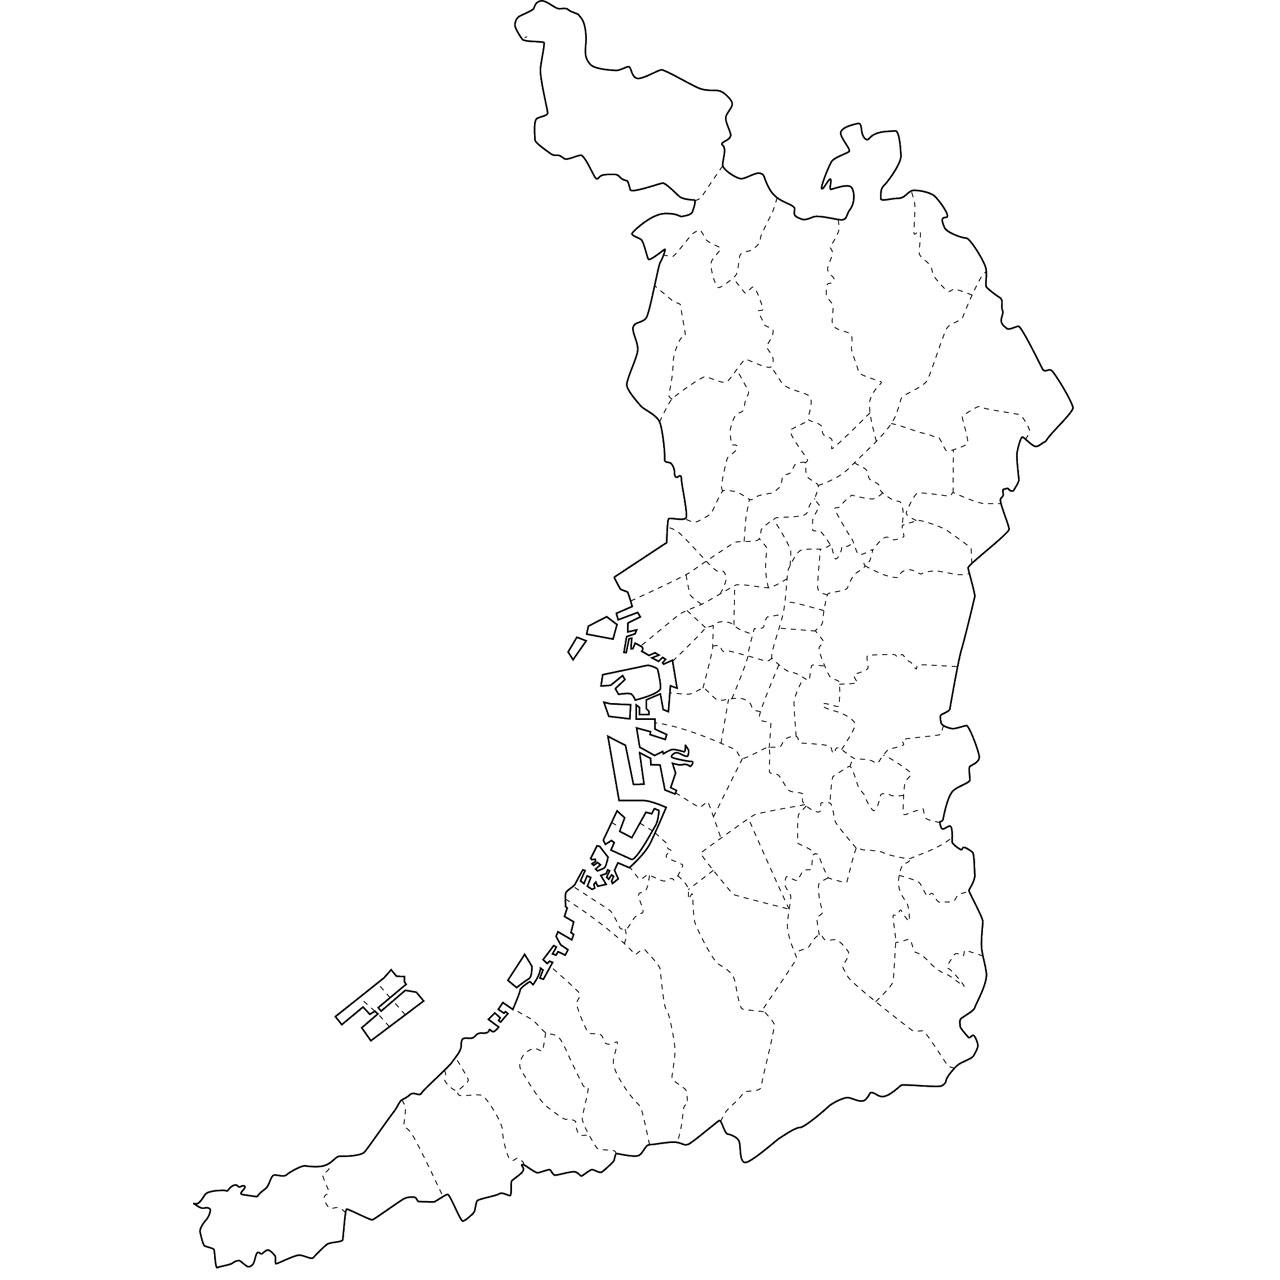 地図イラスト見本(縮小表示) : 東京都 白地図 無料 : 無料